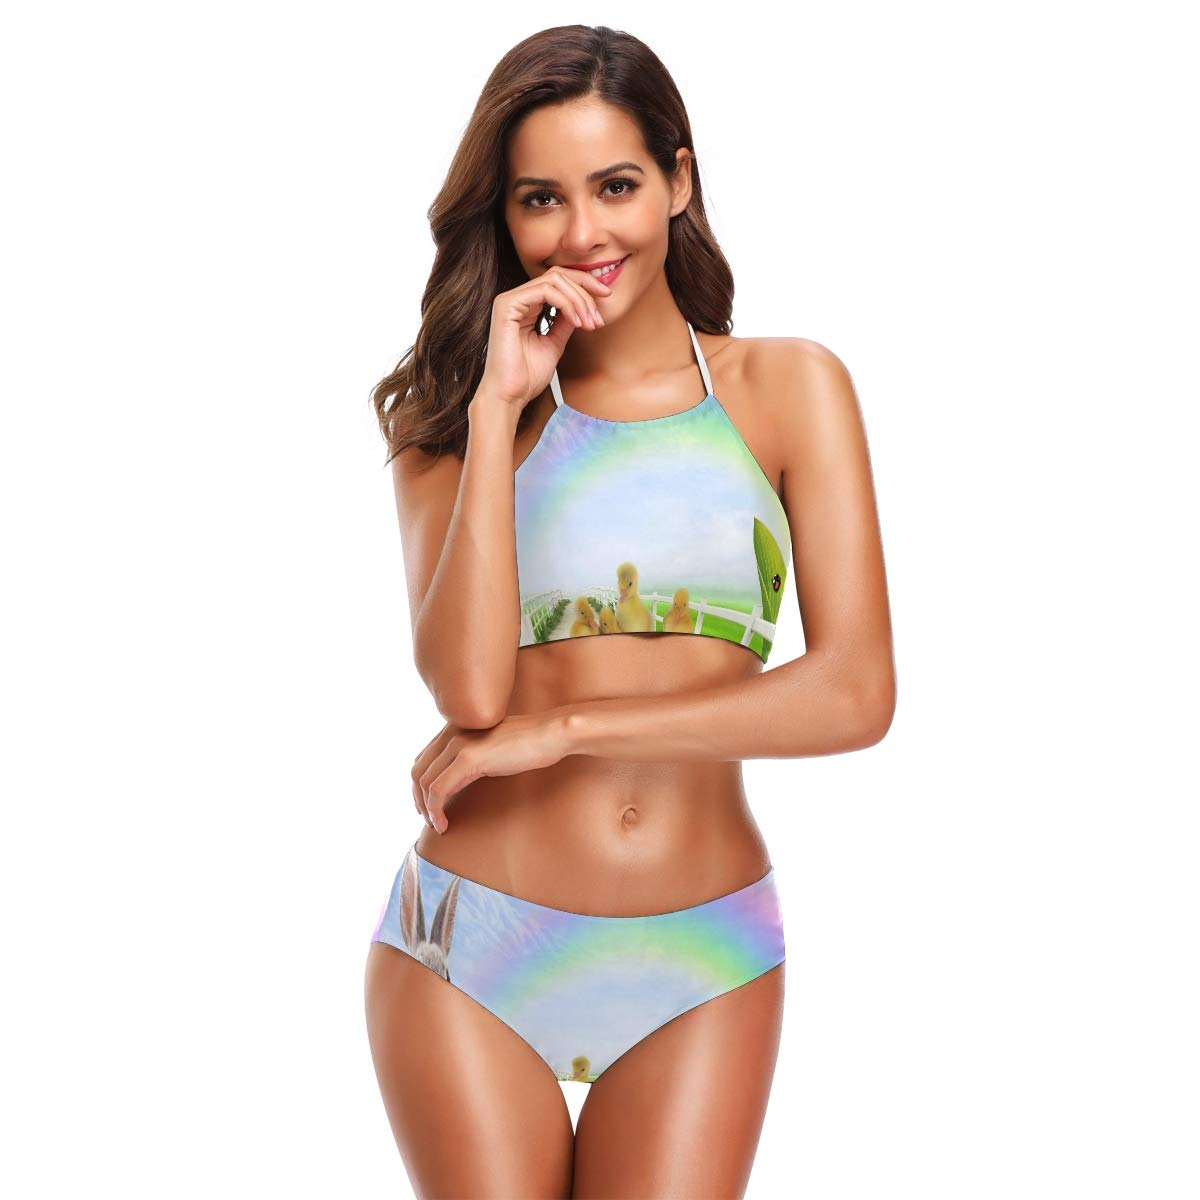 b6432089ce424 Amazon.com: Women Two Piece Bikini Swimsuit Vintage Wallpaper Padded  Vintage Eres Swimsuit: Clothing